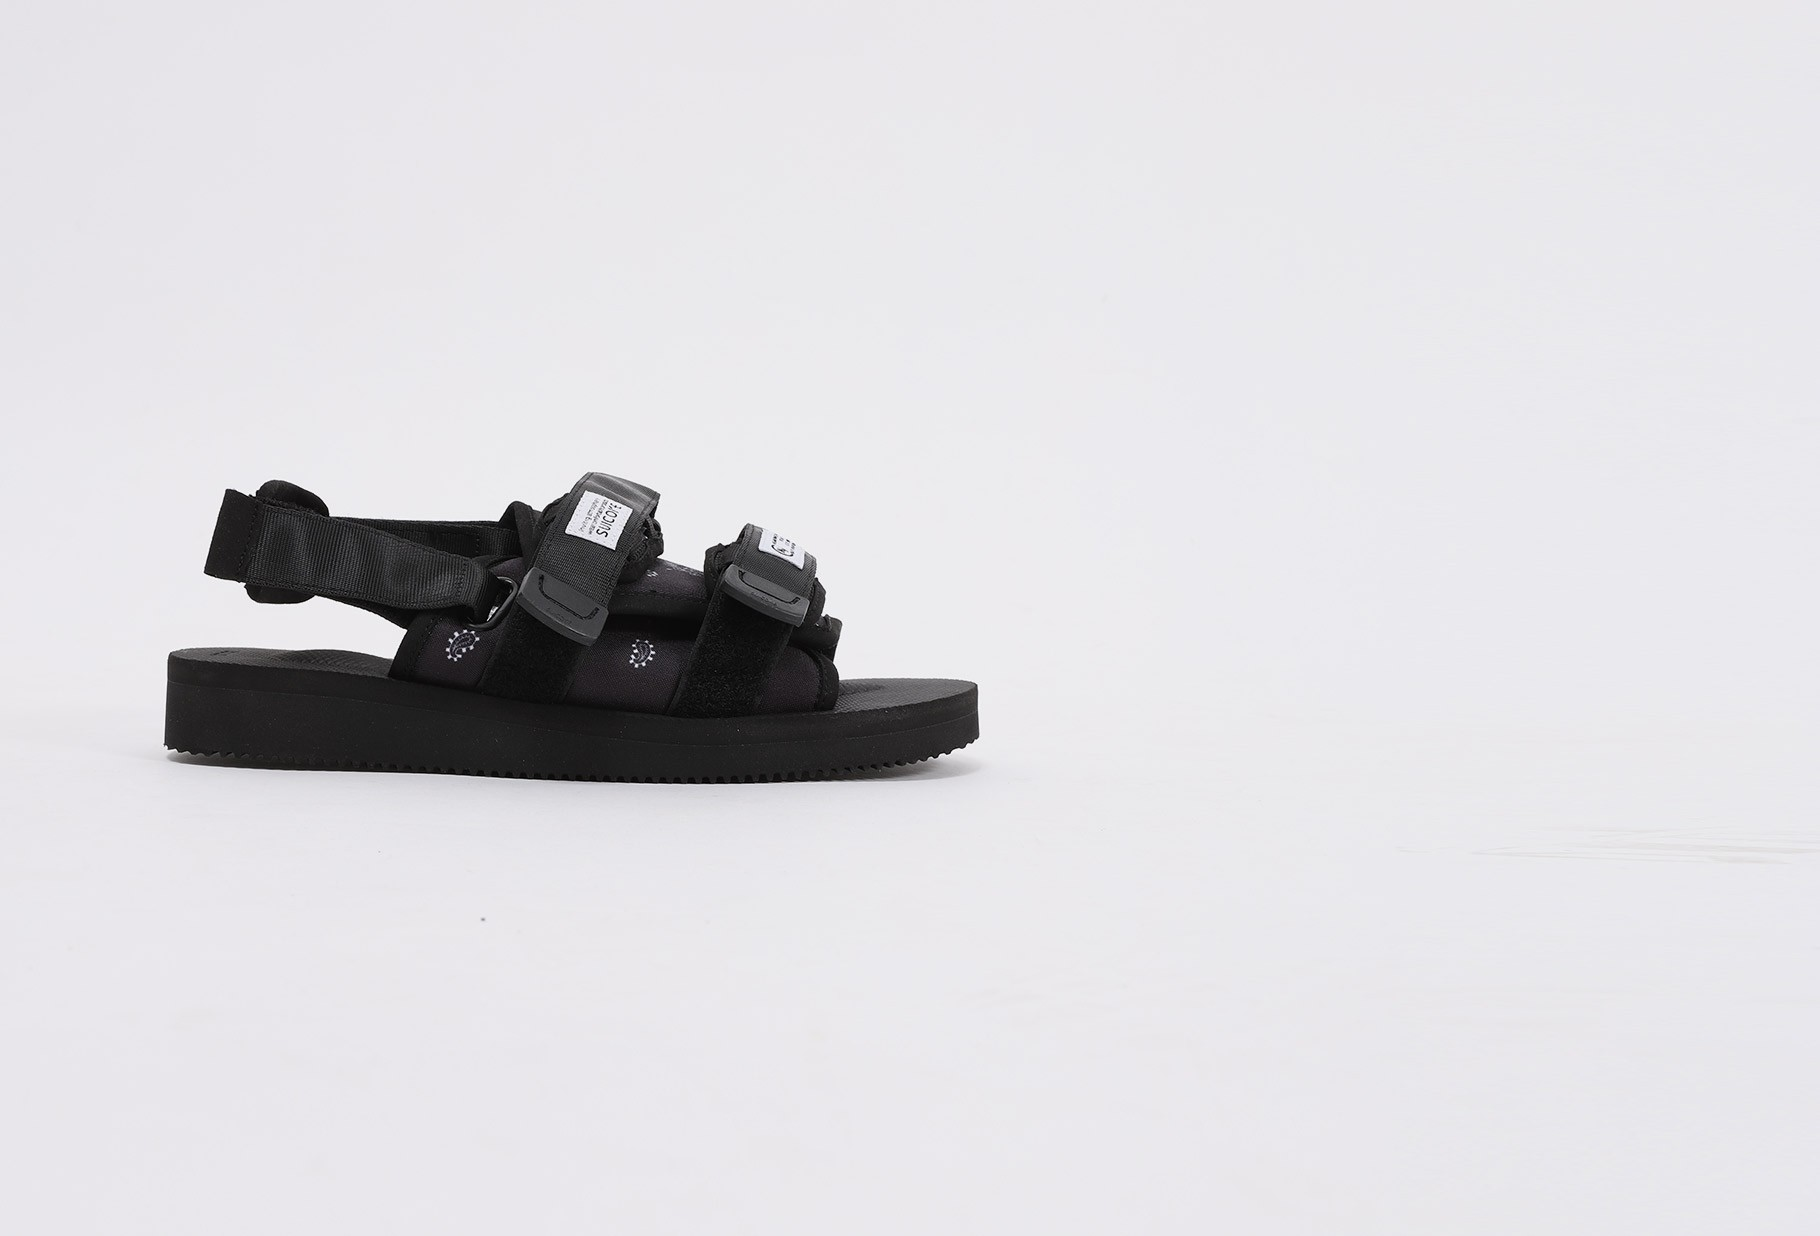 NEIGHBORHOOD / Suicoke nhsi moto / nr-sandal Black